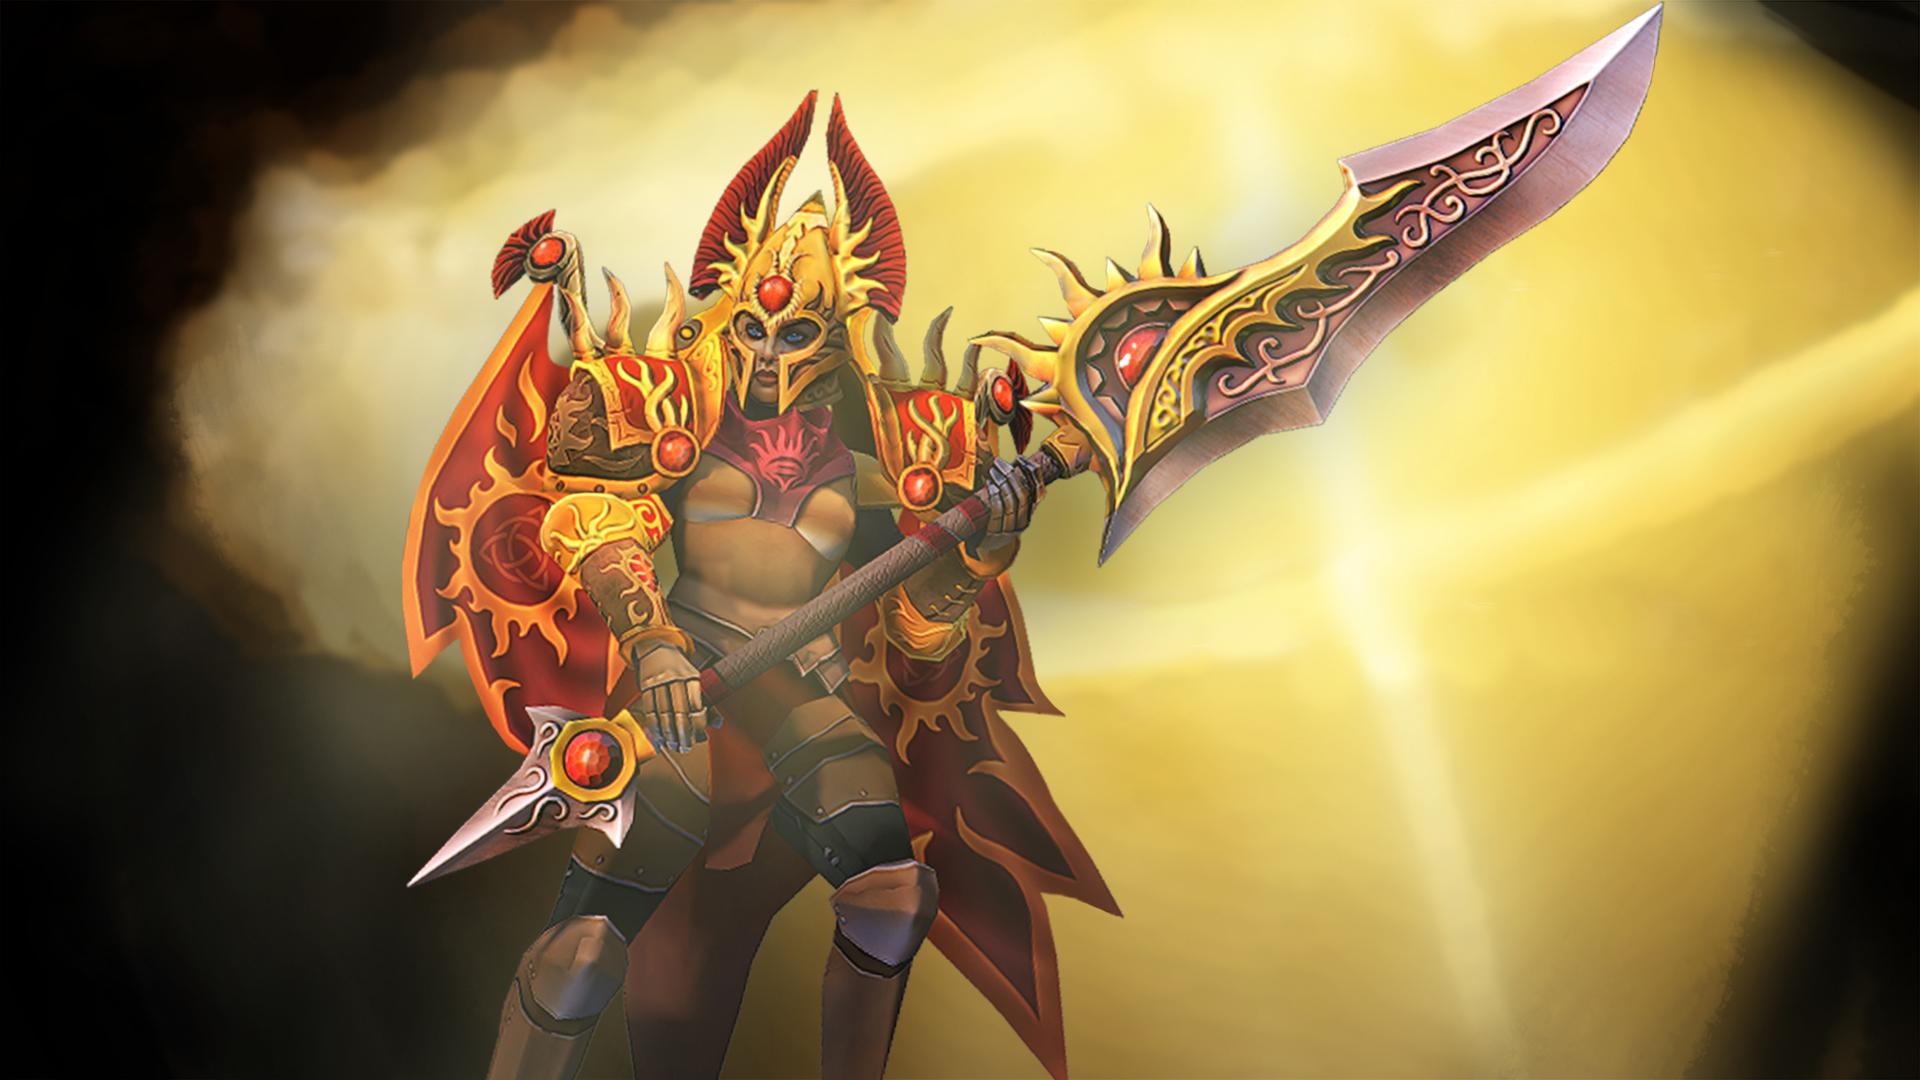 Dota 2 Legion Commander 3r Wallpaper HD